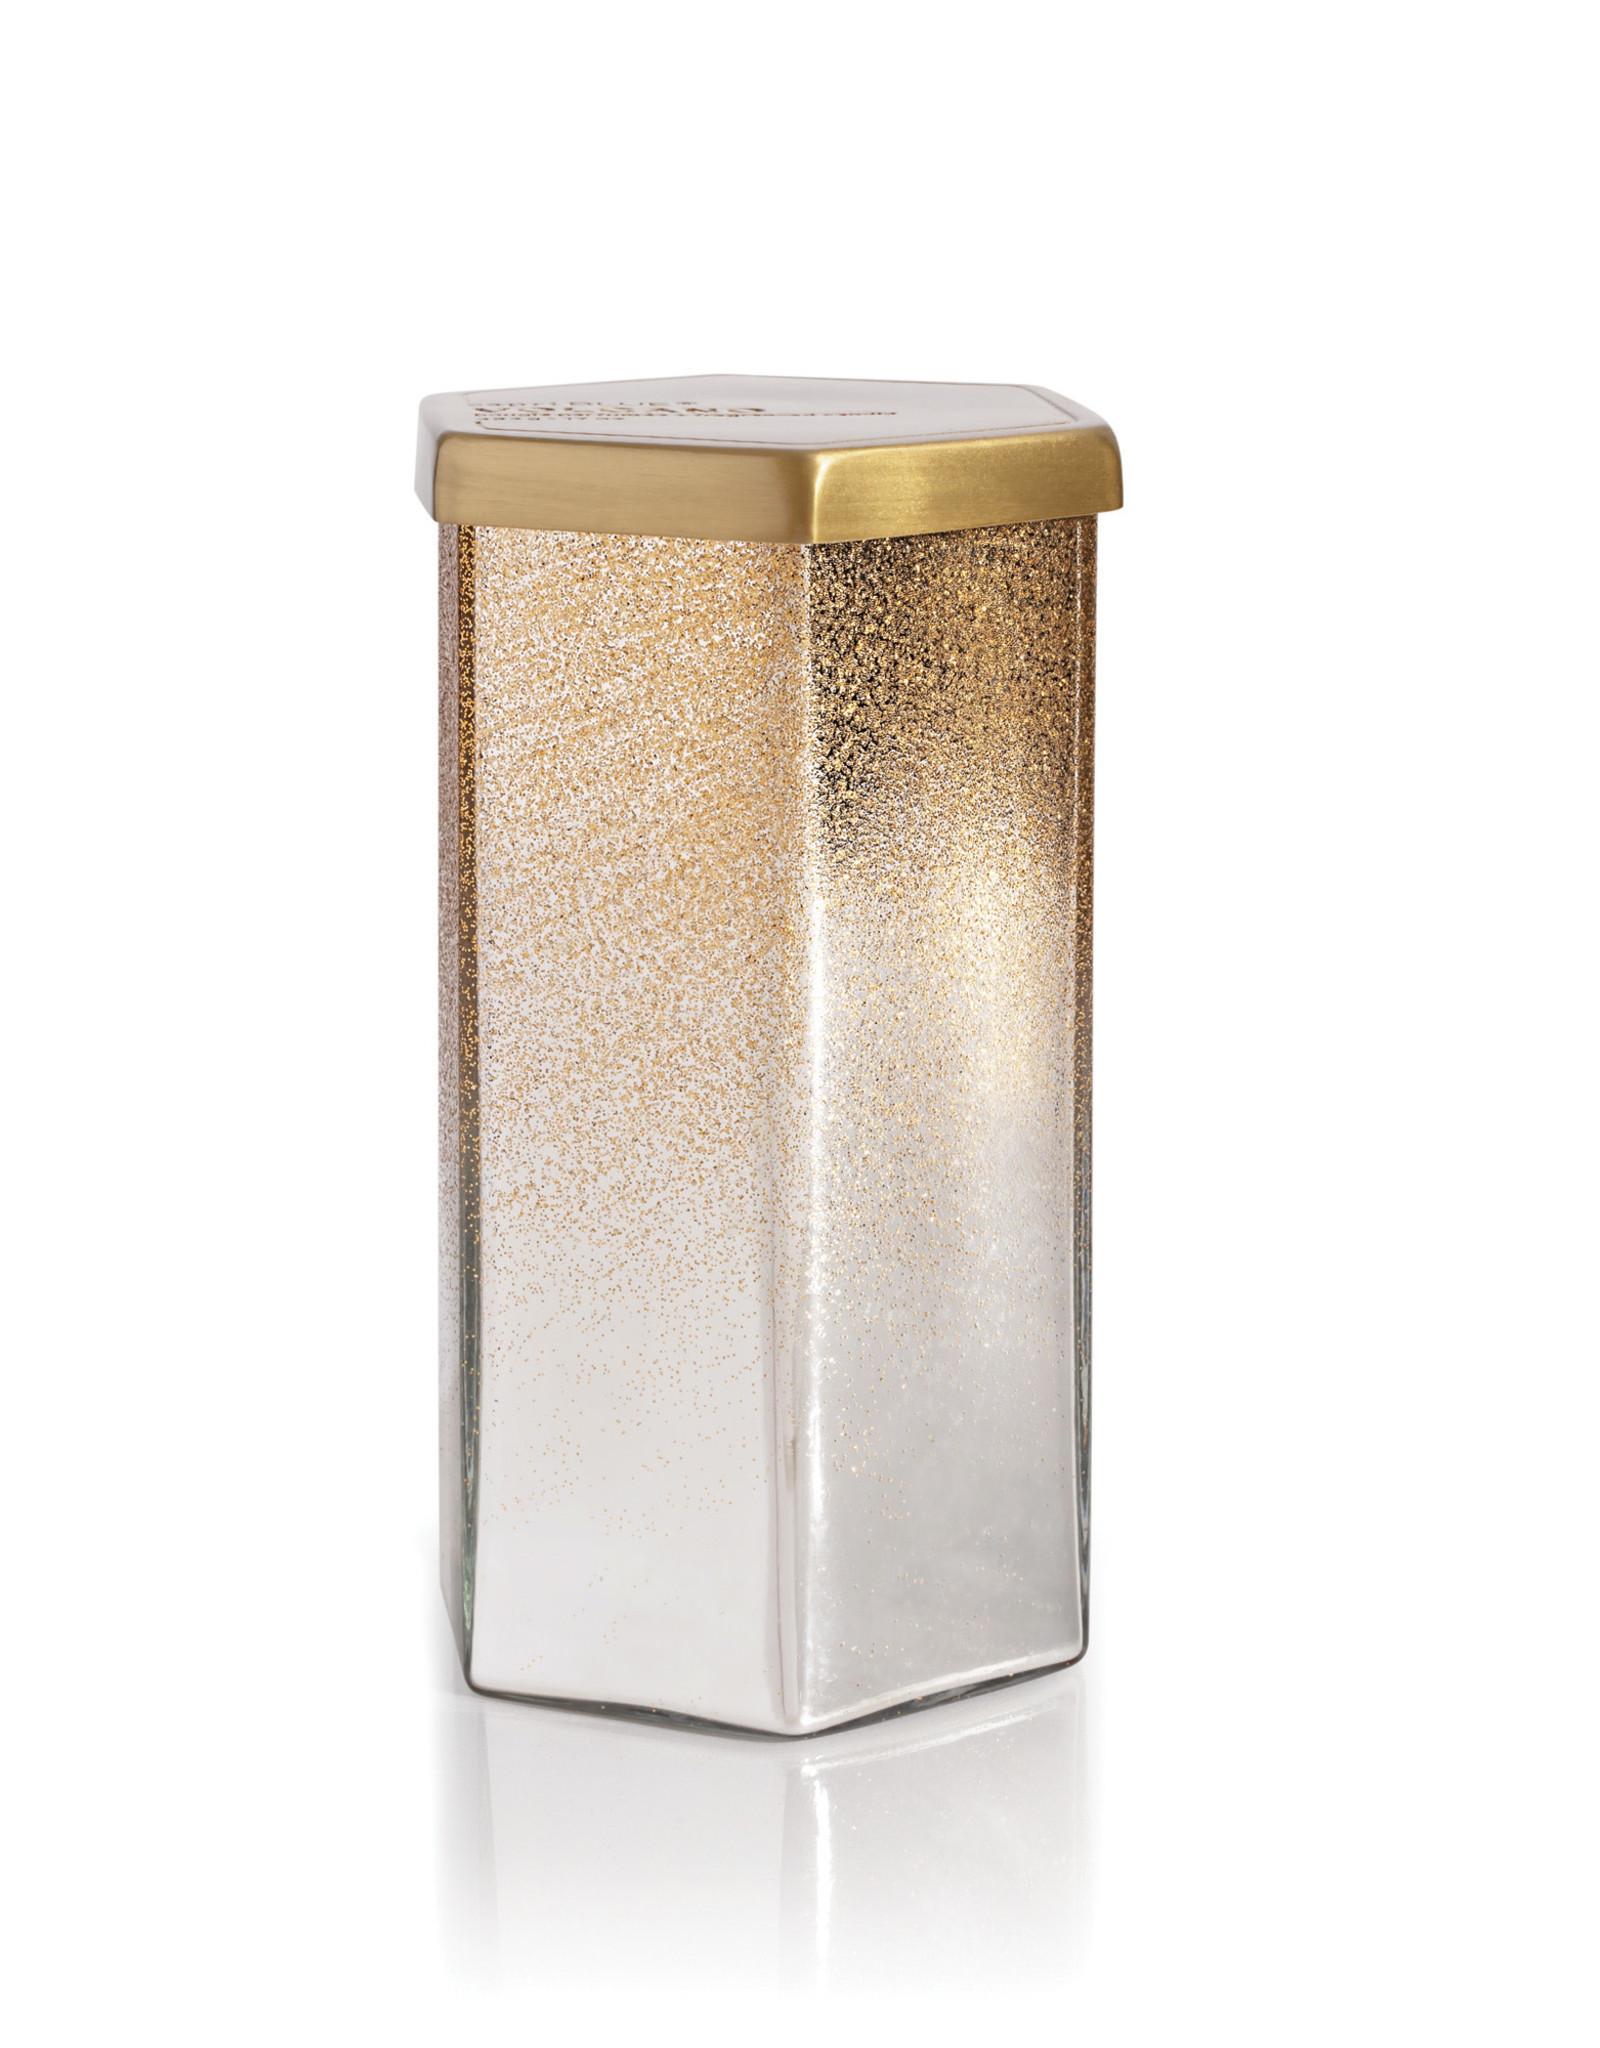 capri BLUE® Crystal Pine Glitz Hexagon Jar